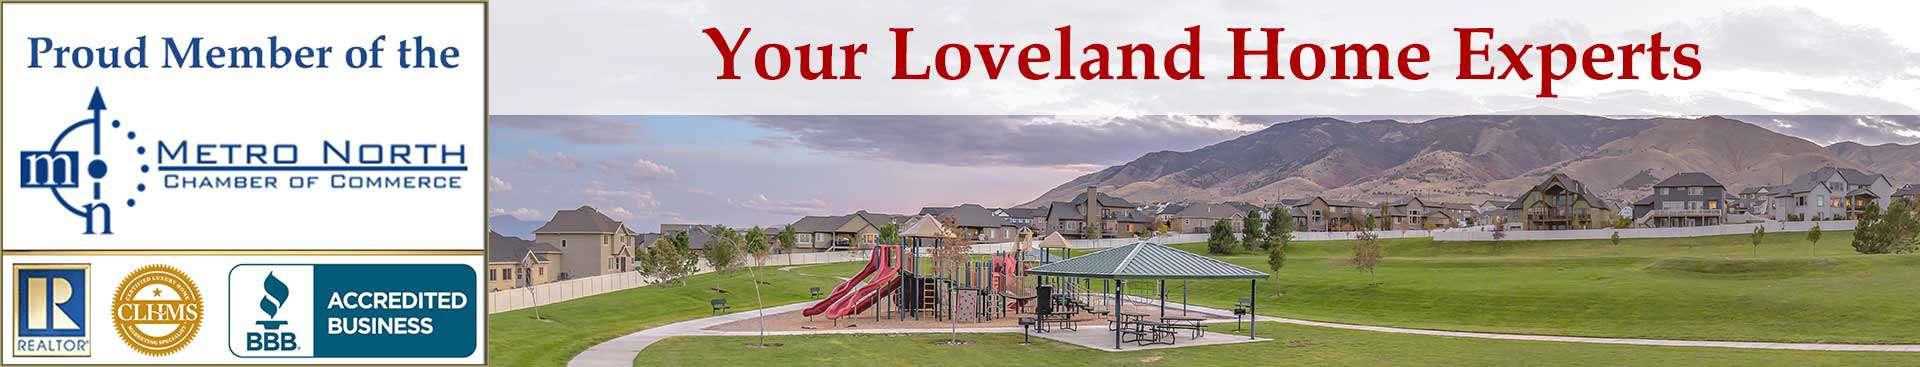 Loveland Accreditations Banner